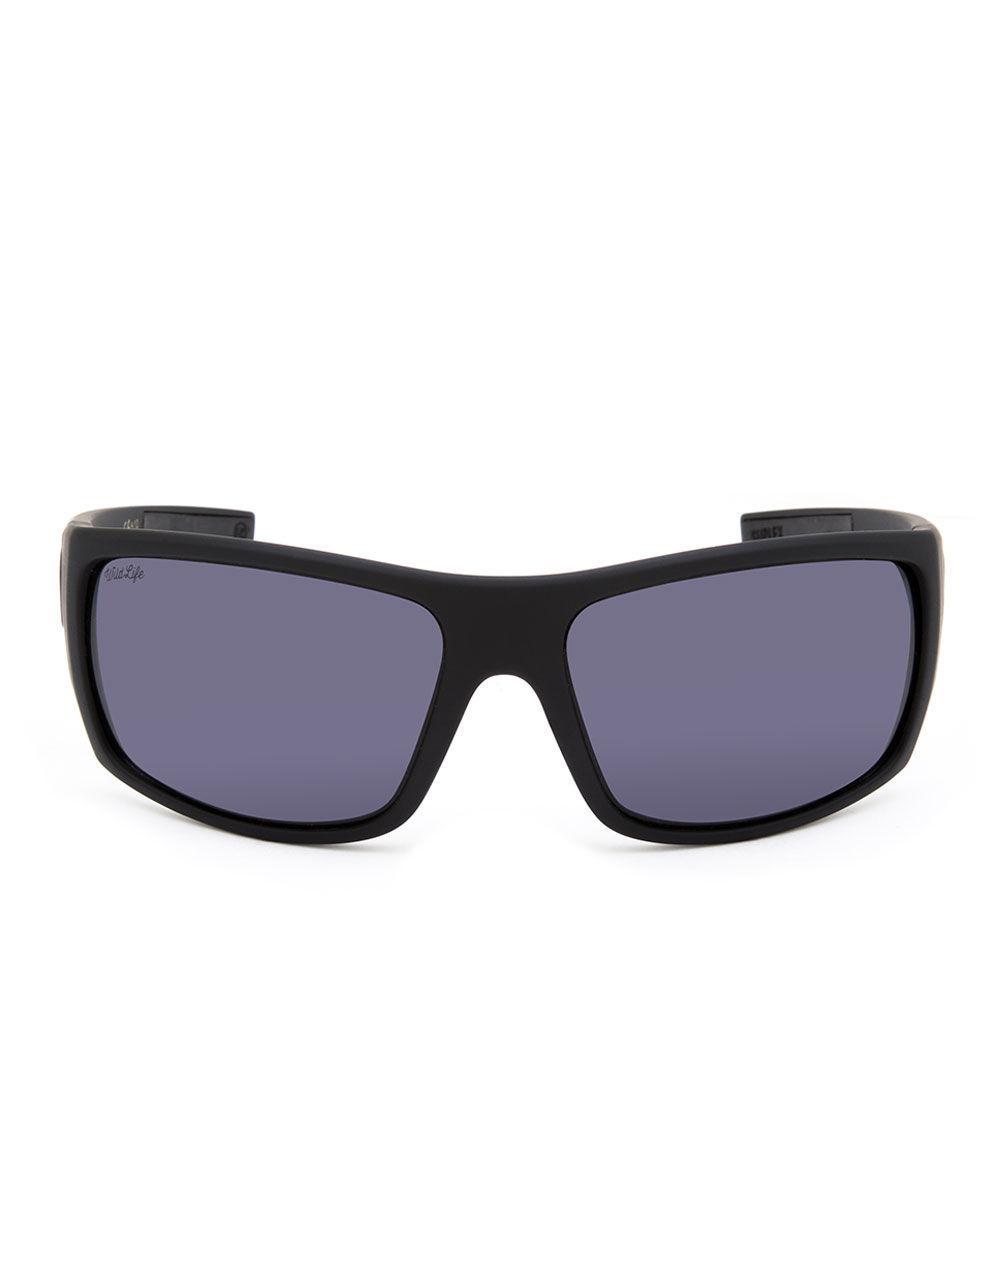 bdfc5a7938b Lyst - Von Zipper Suplex Wildlife Polarized Sunglasses for Men